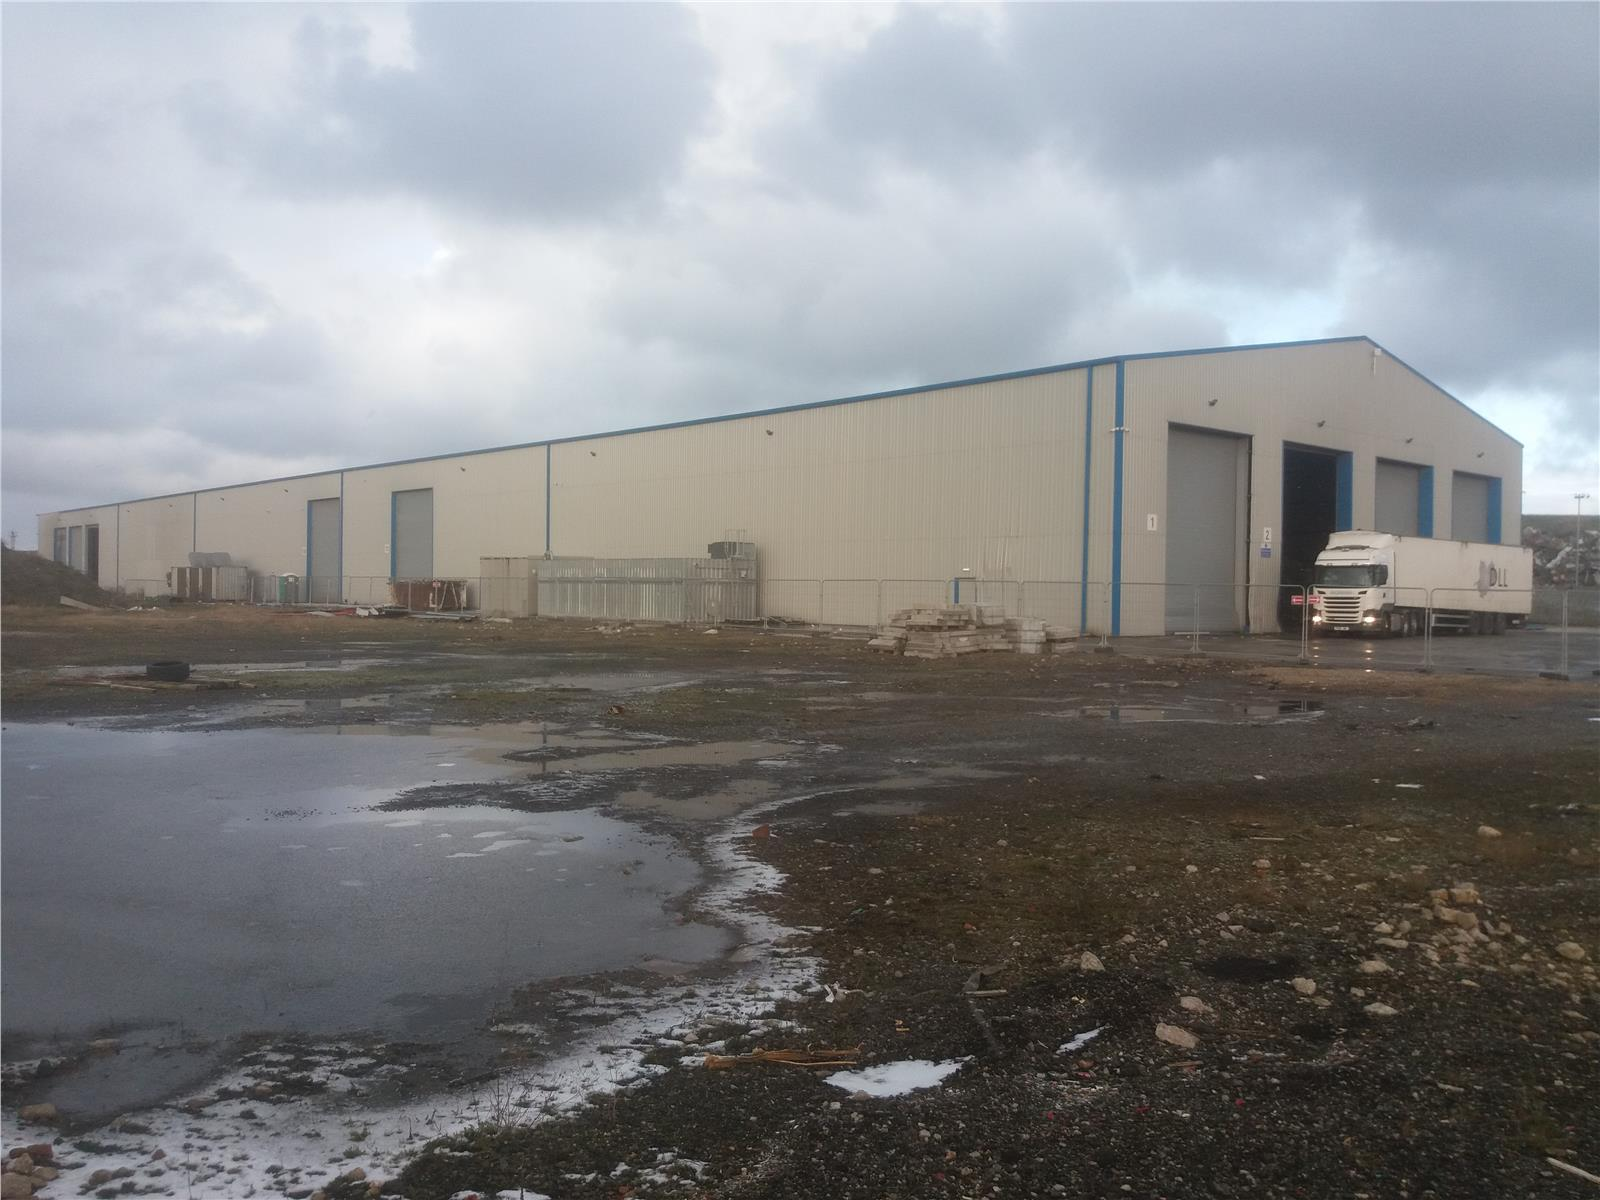 Fibre Materials Recycling Facility, Windermere Road, Longhill Road Industrial Estate, Hartlepool, TS25